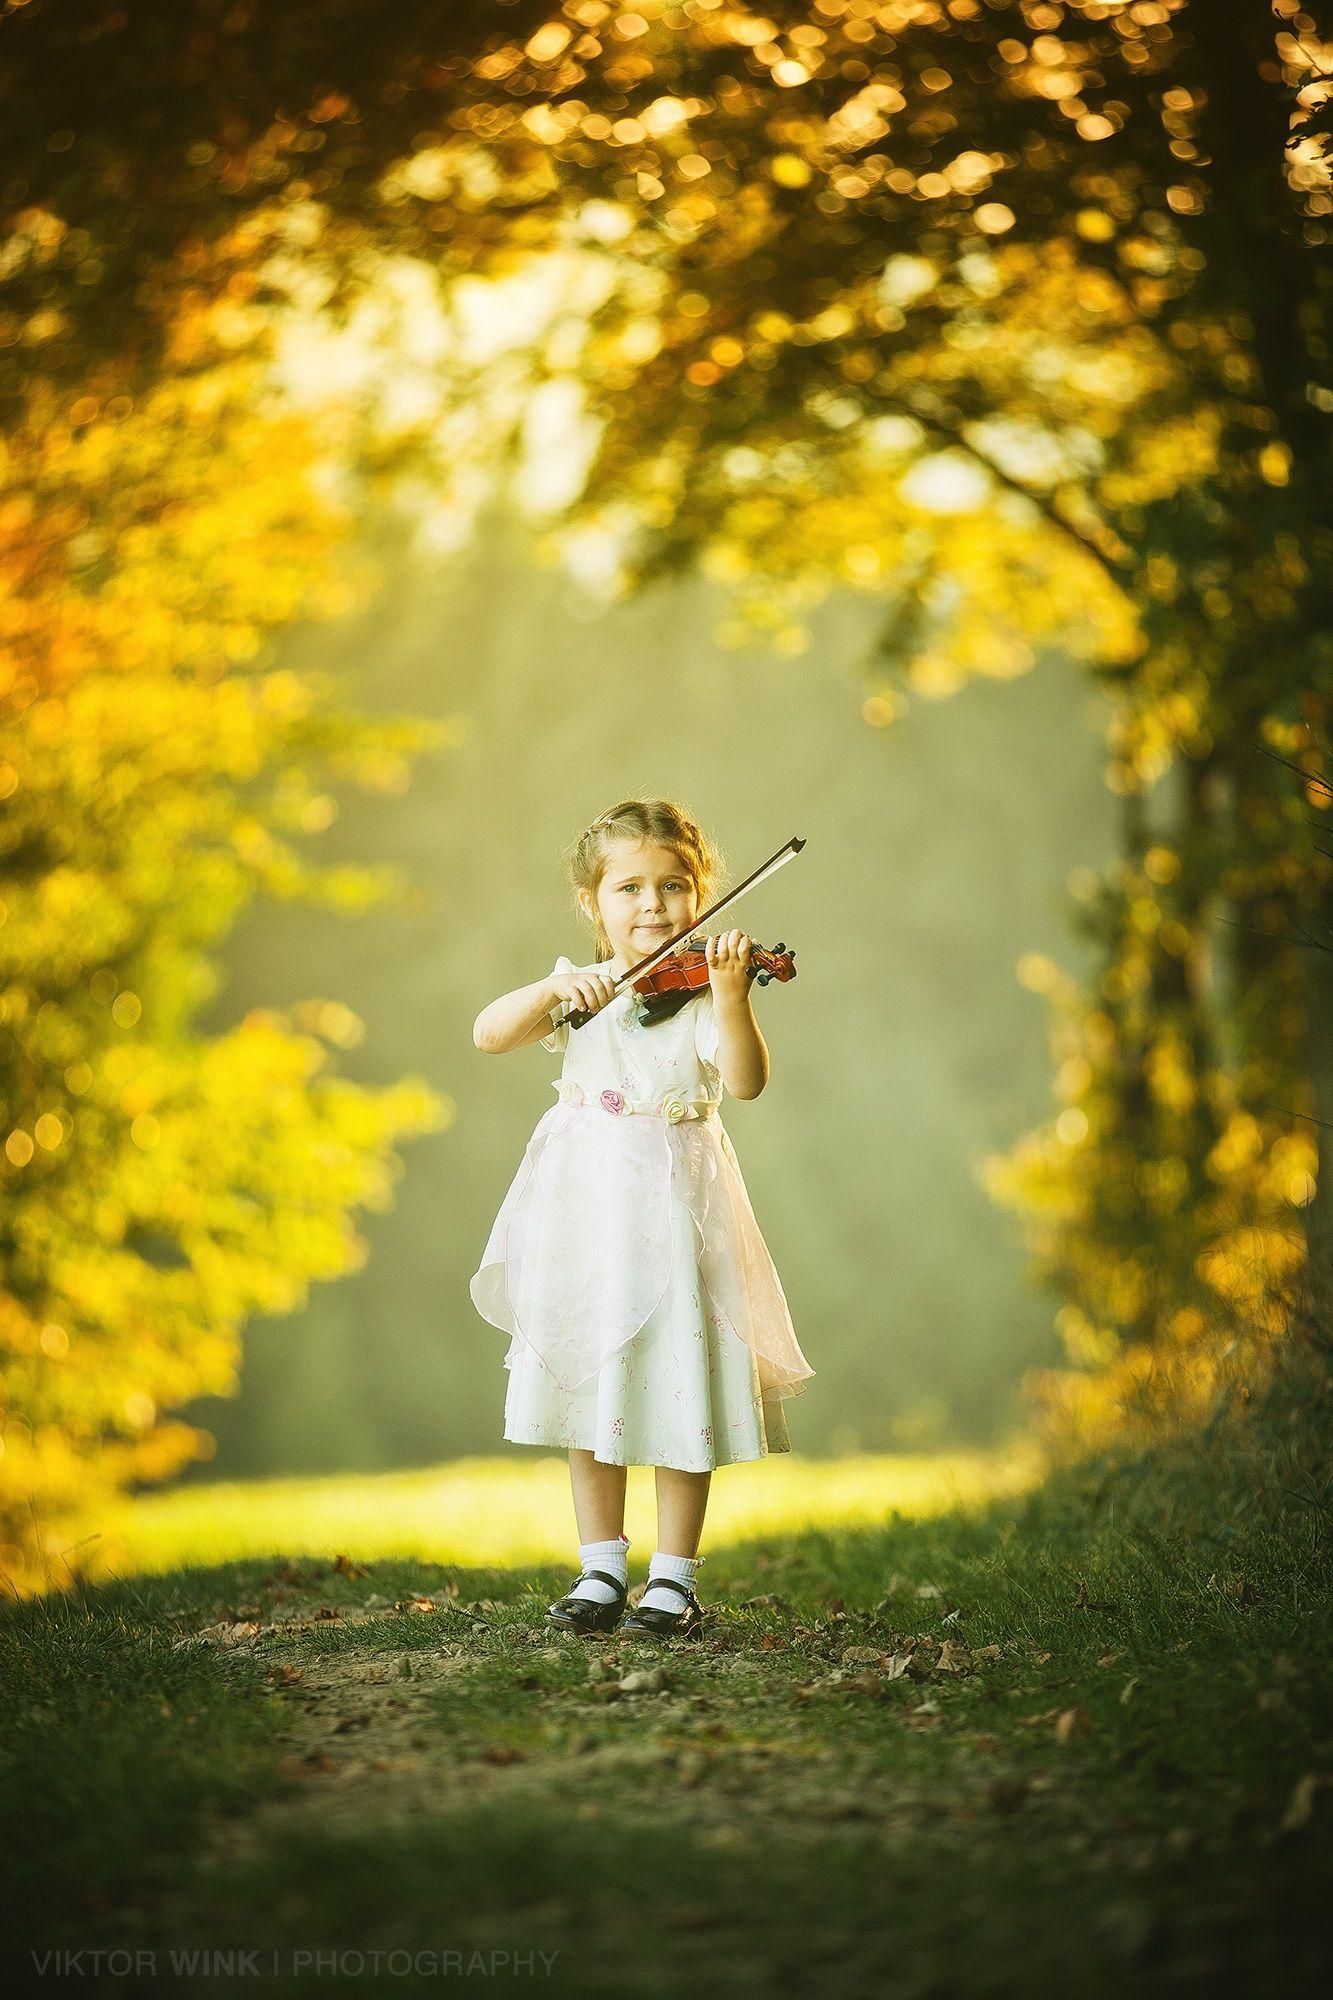 V I O L I N G I R L by Viktor Wink on 500px Violin